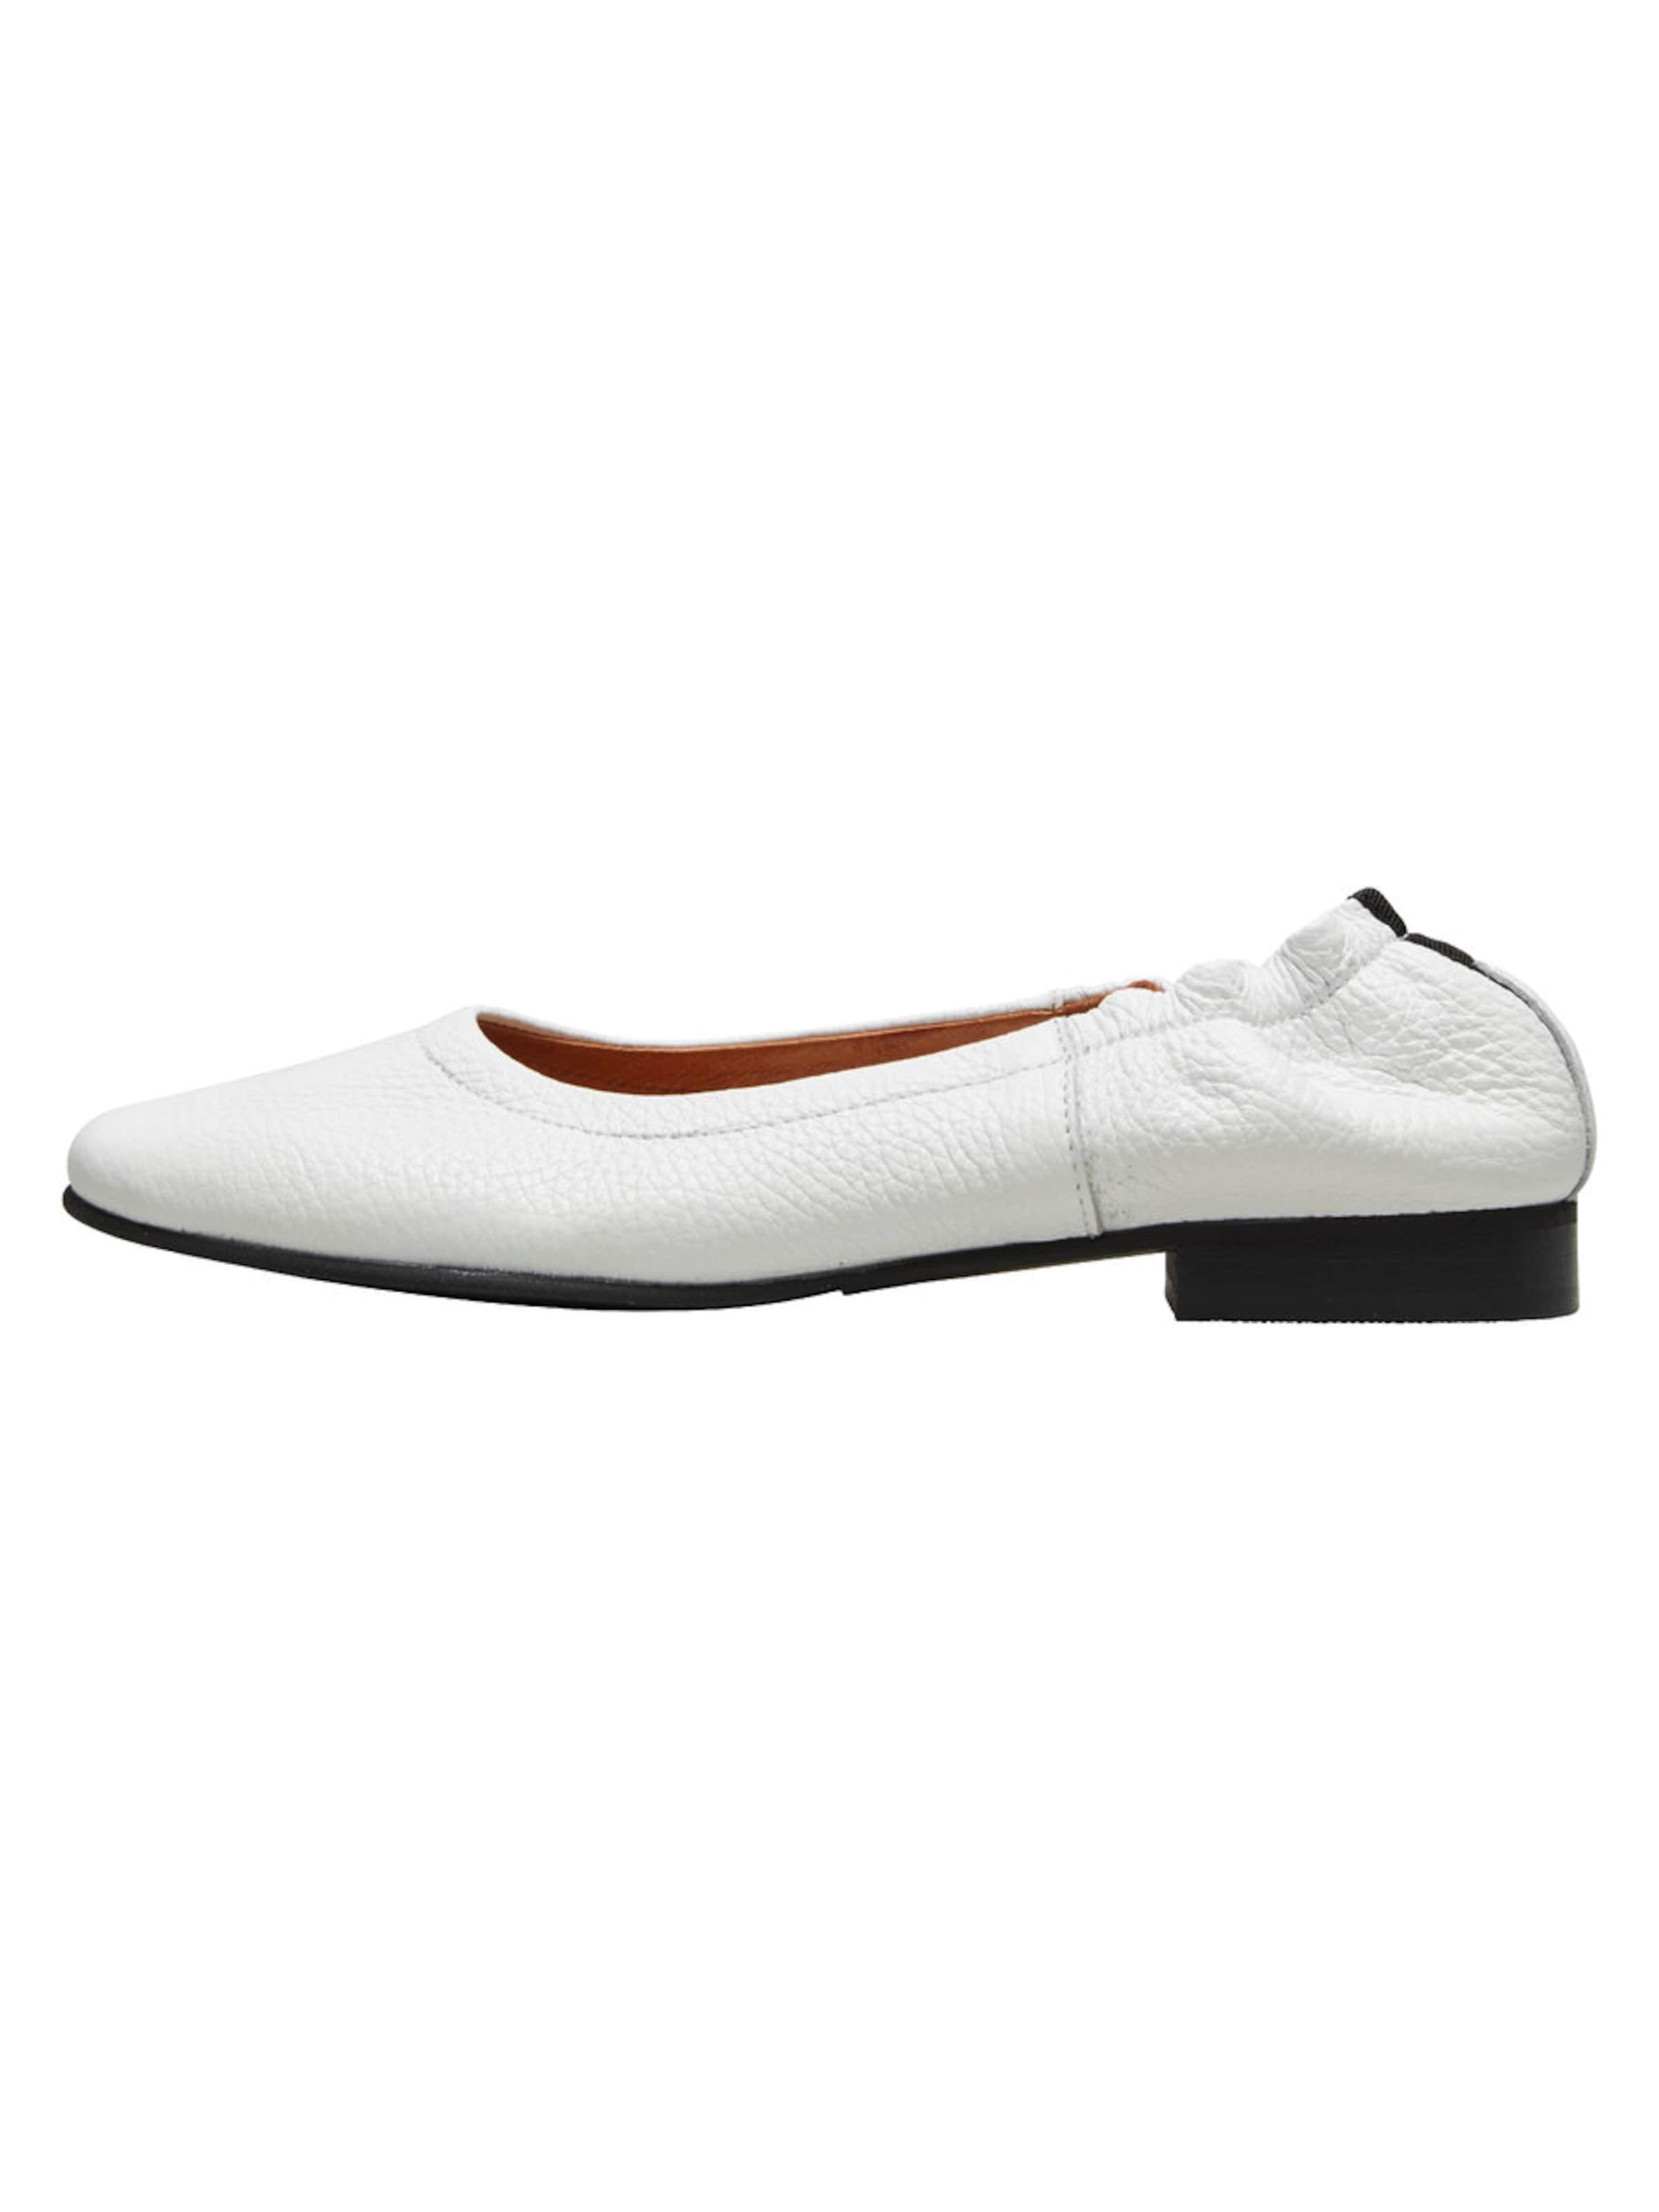 SELECTED FEMME Ballerinas Verschleißfeste billige Schuhe